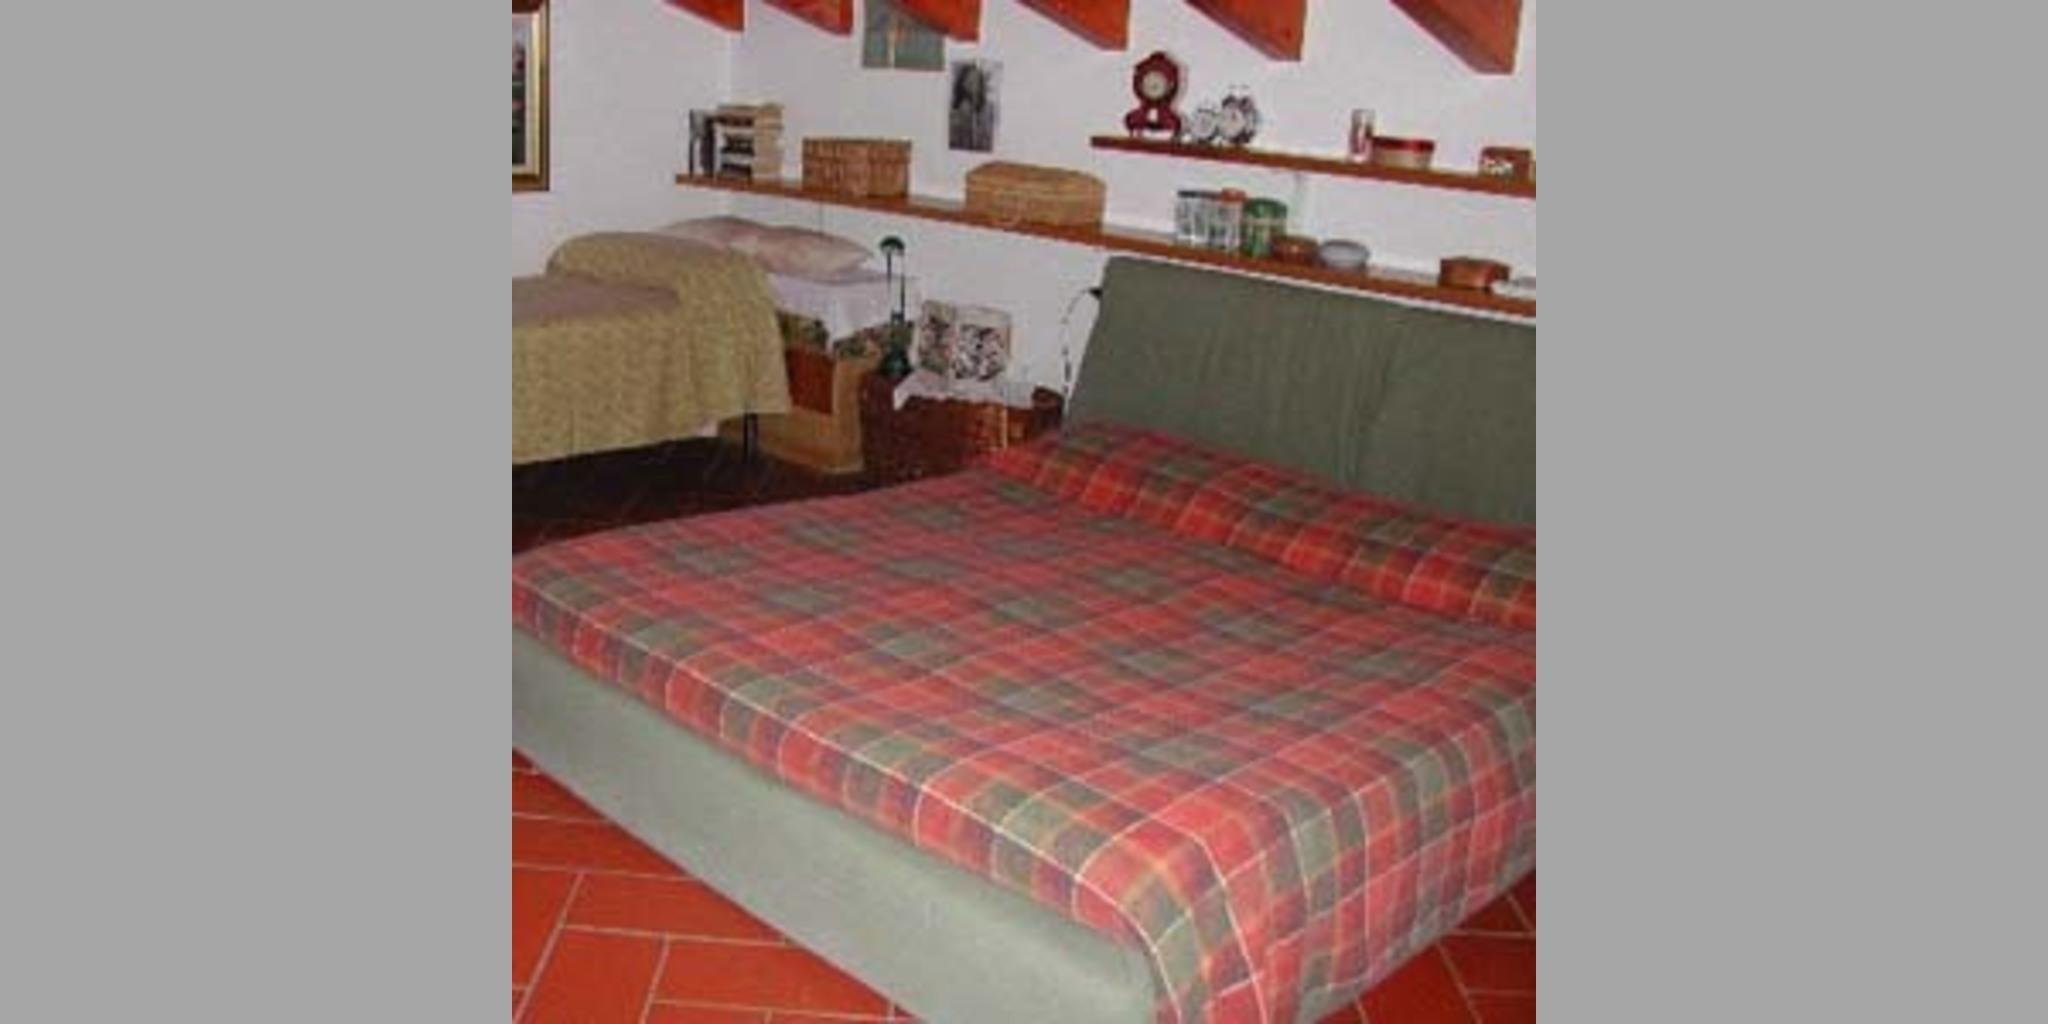 Bed & Breakfast Olgiate Molgora - Lago Di Como  Olgiate Molgora